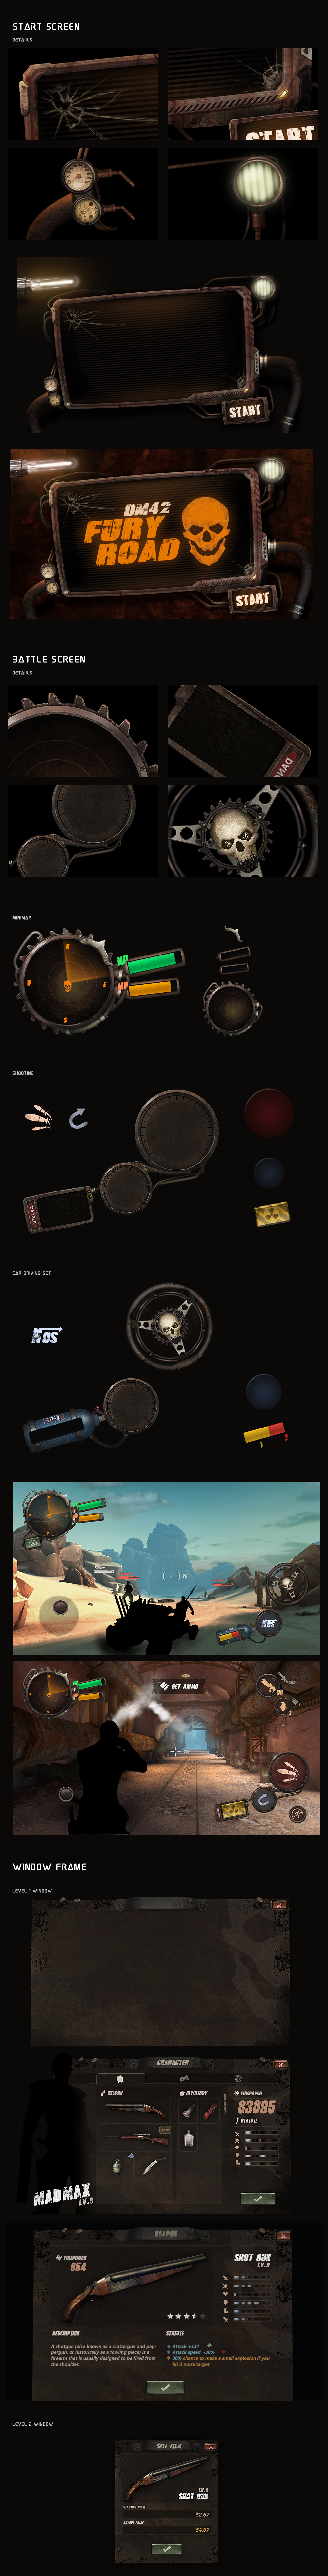 rusty game ui kit on Behance